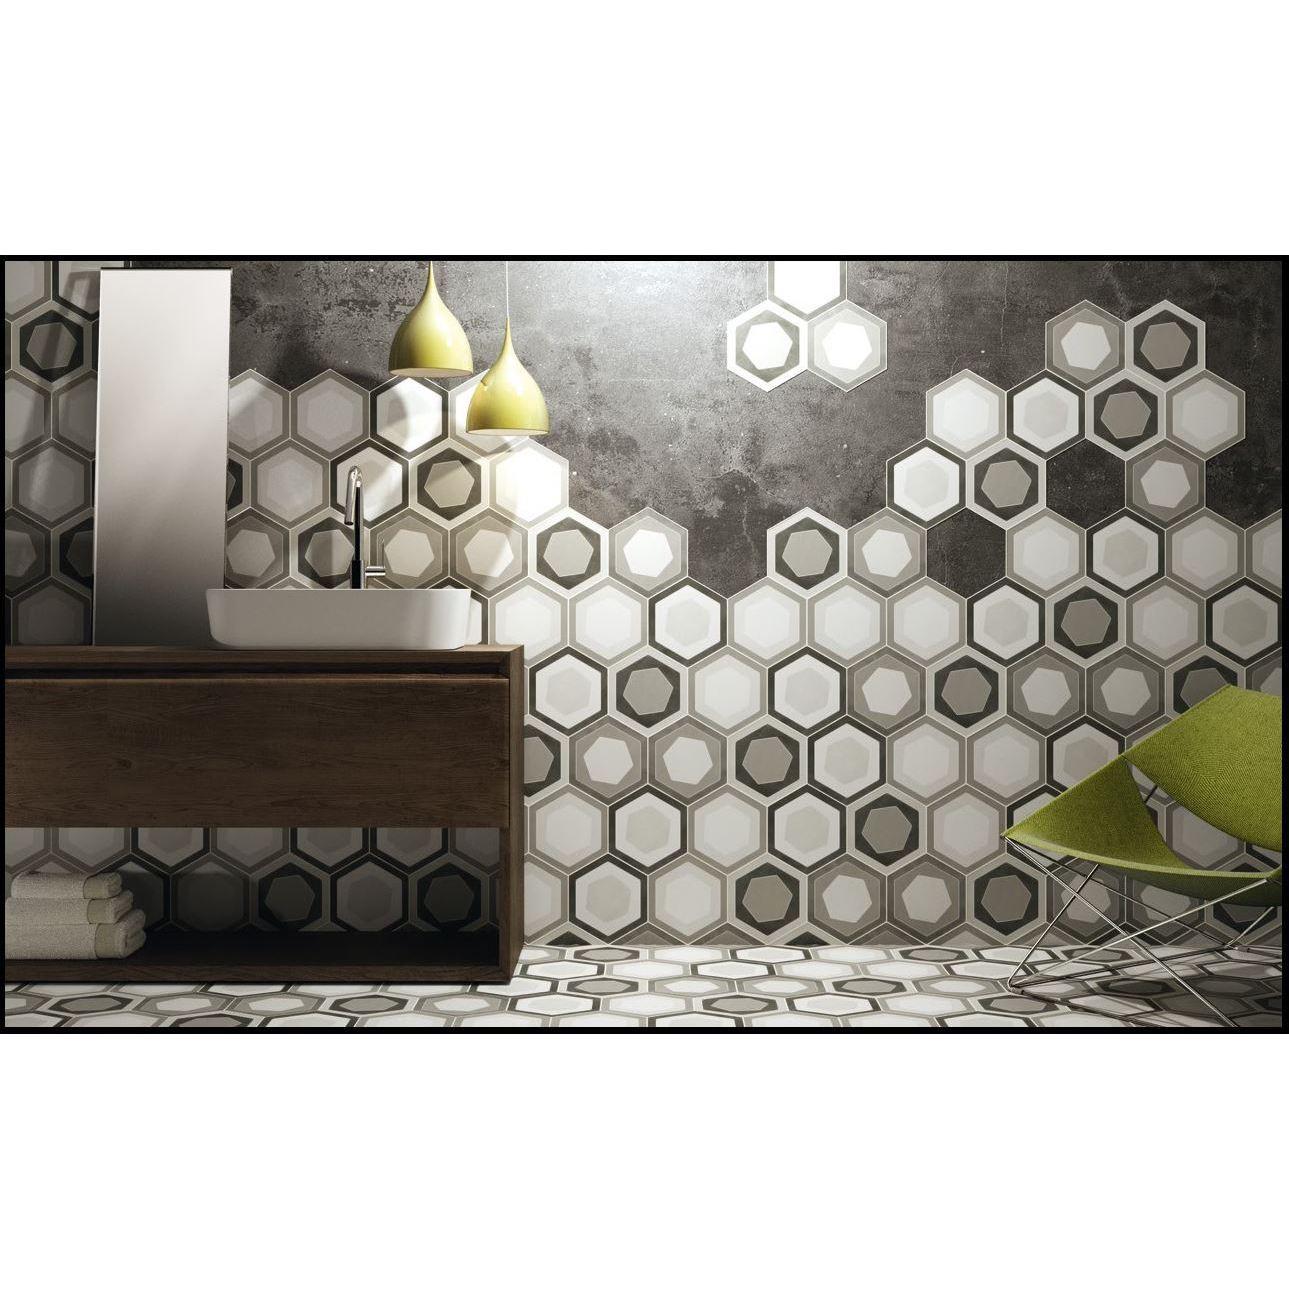 Black Label 9x8 Hexa Gris Porcelain Floor and Wall Tile (...